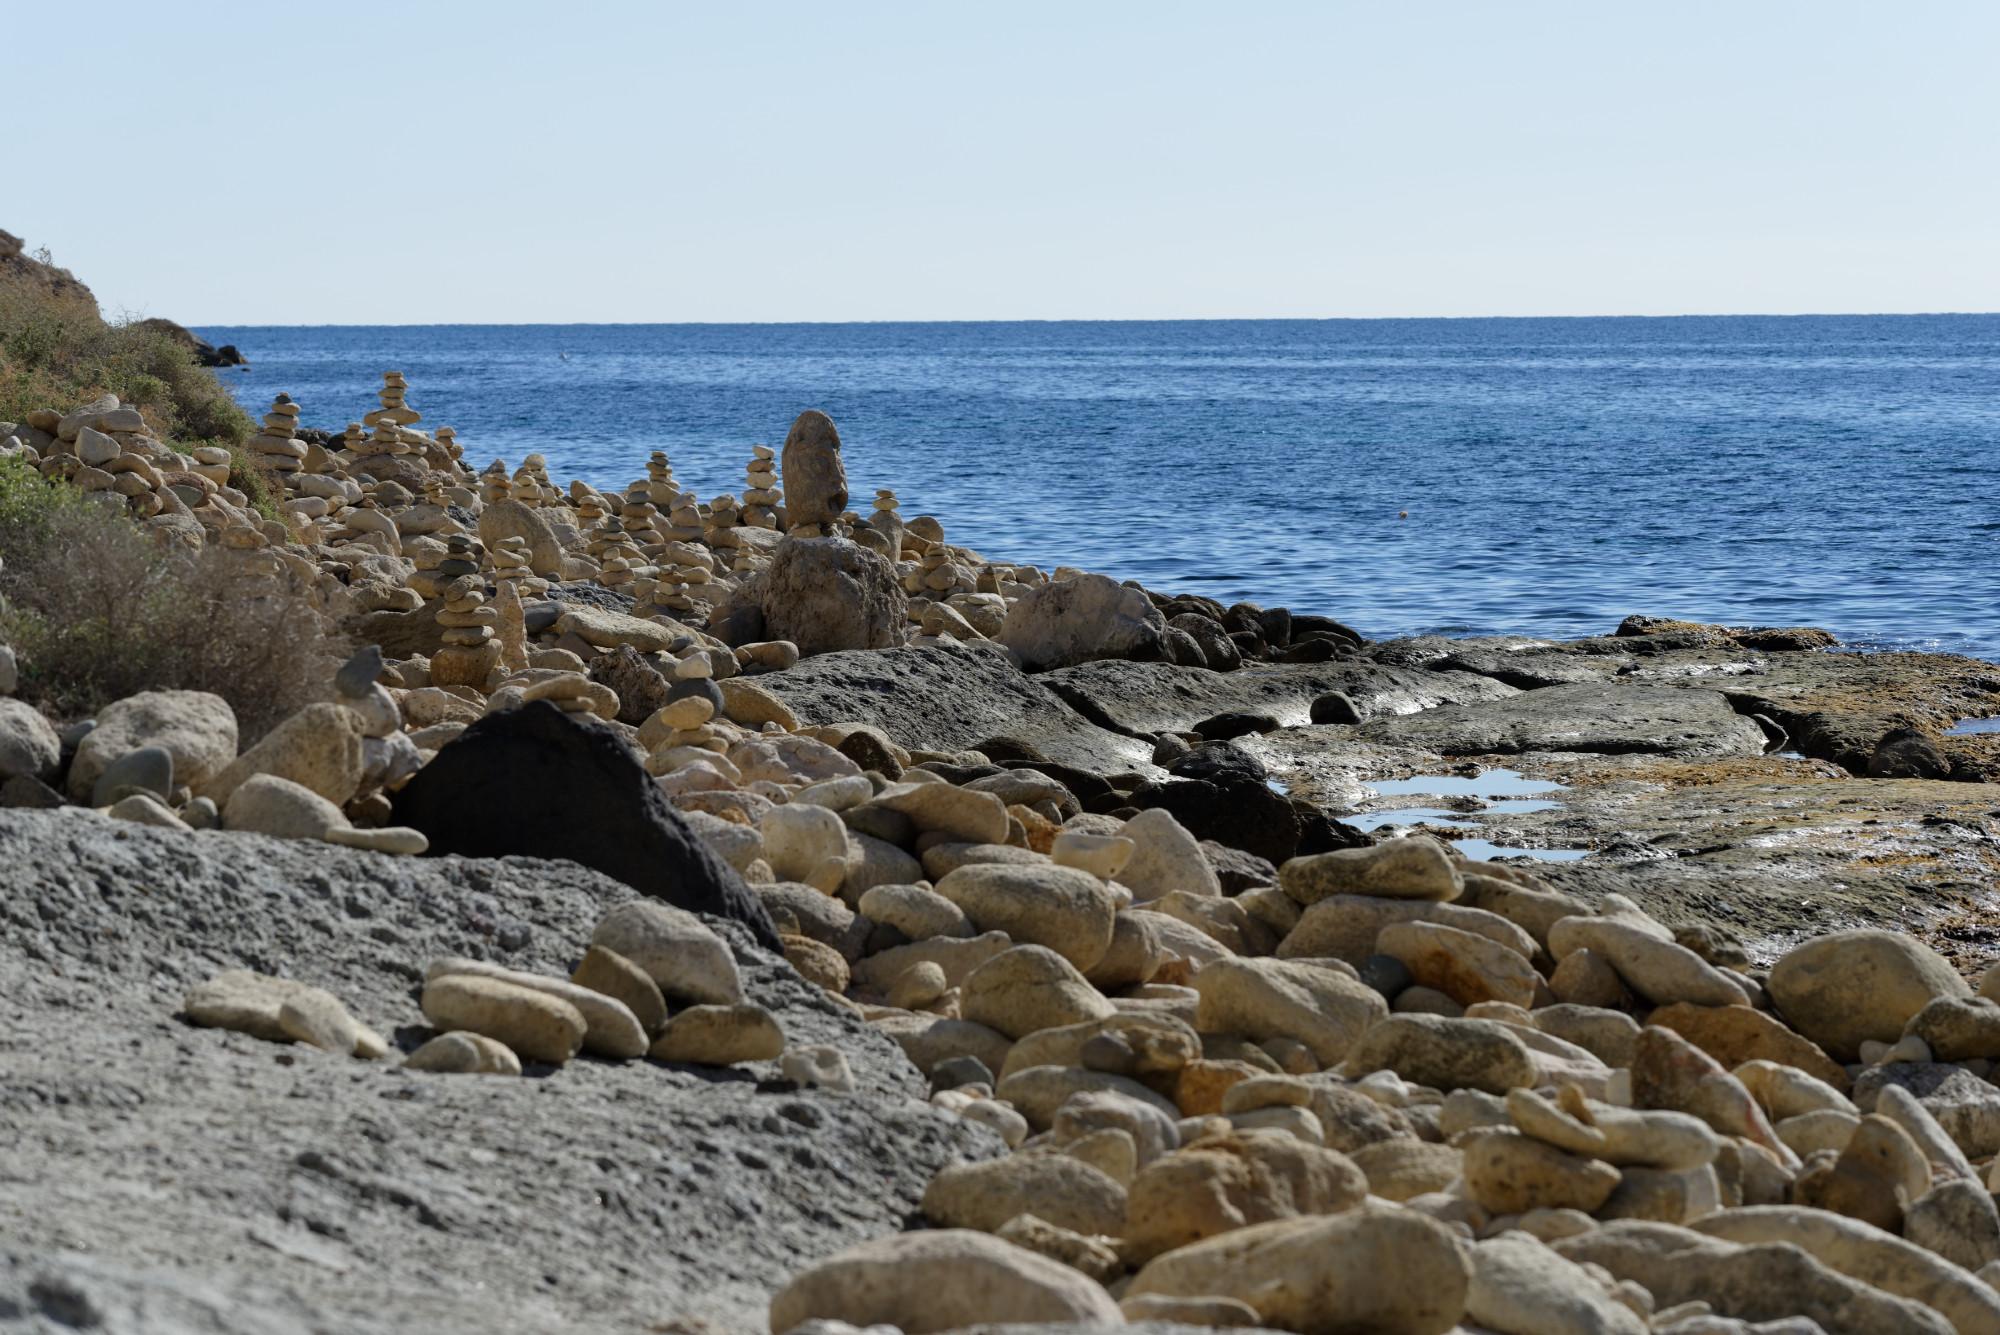 171213-Marche Las Negras-Cala San Pedro-Las Negras (67) (Cabo de Gata-Andalousie)